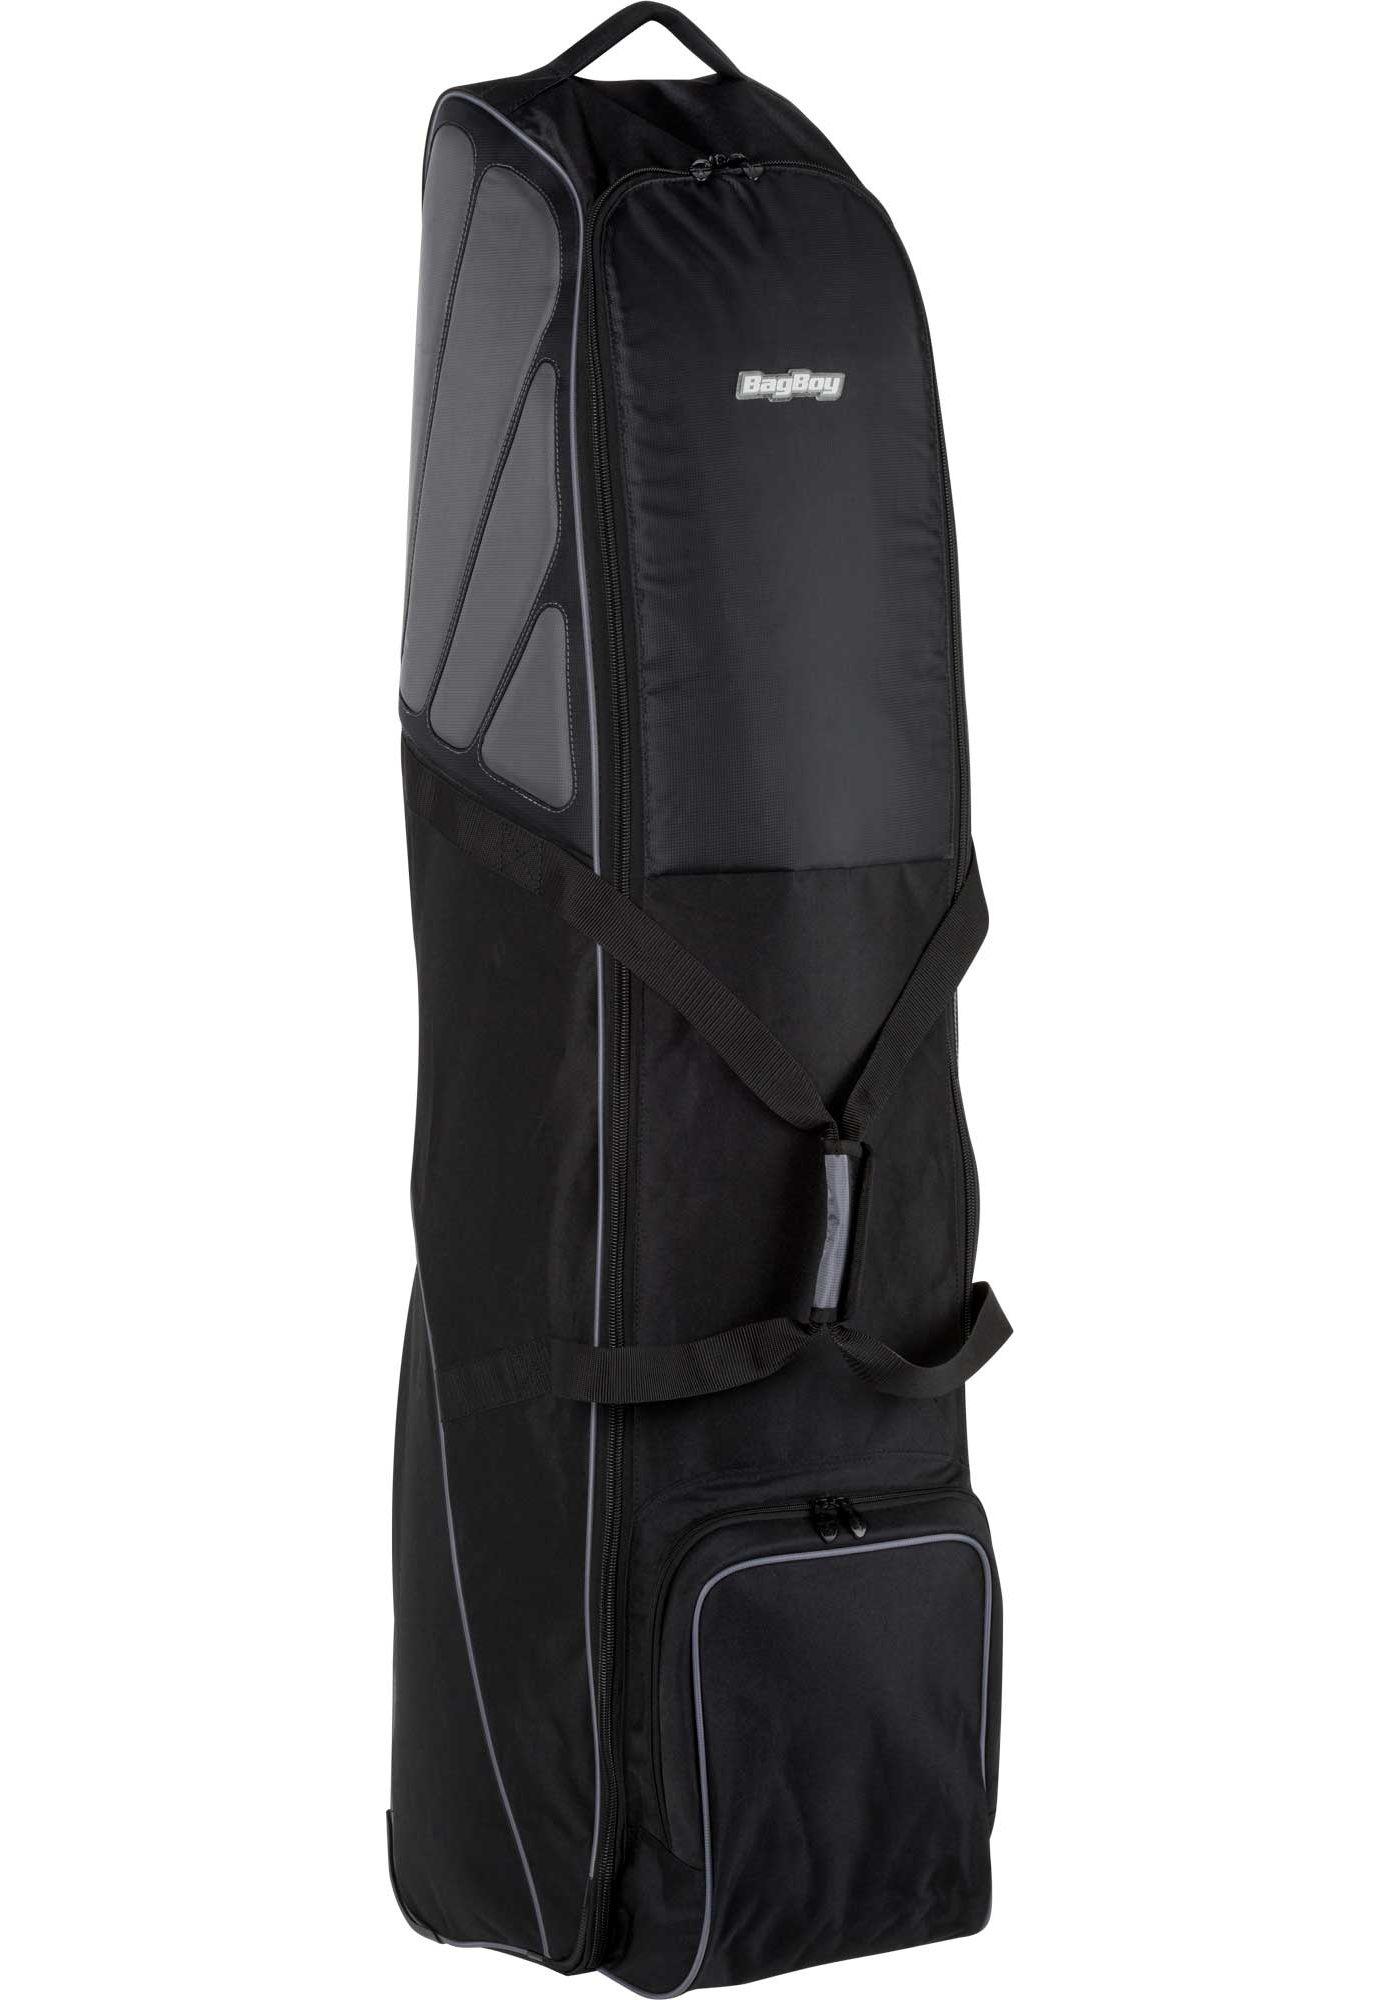 Bag Boy T-650 Travel Cover